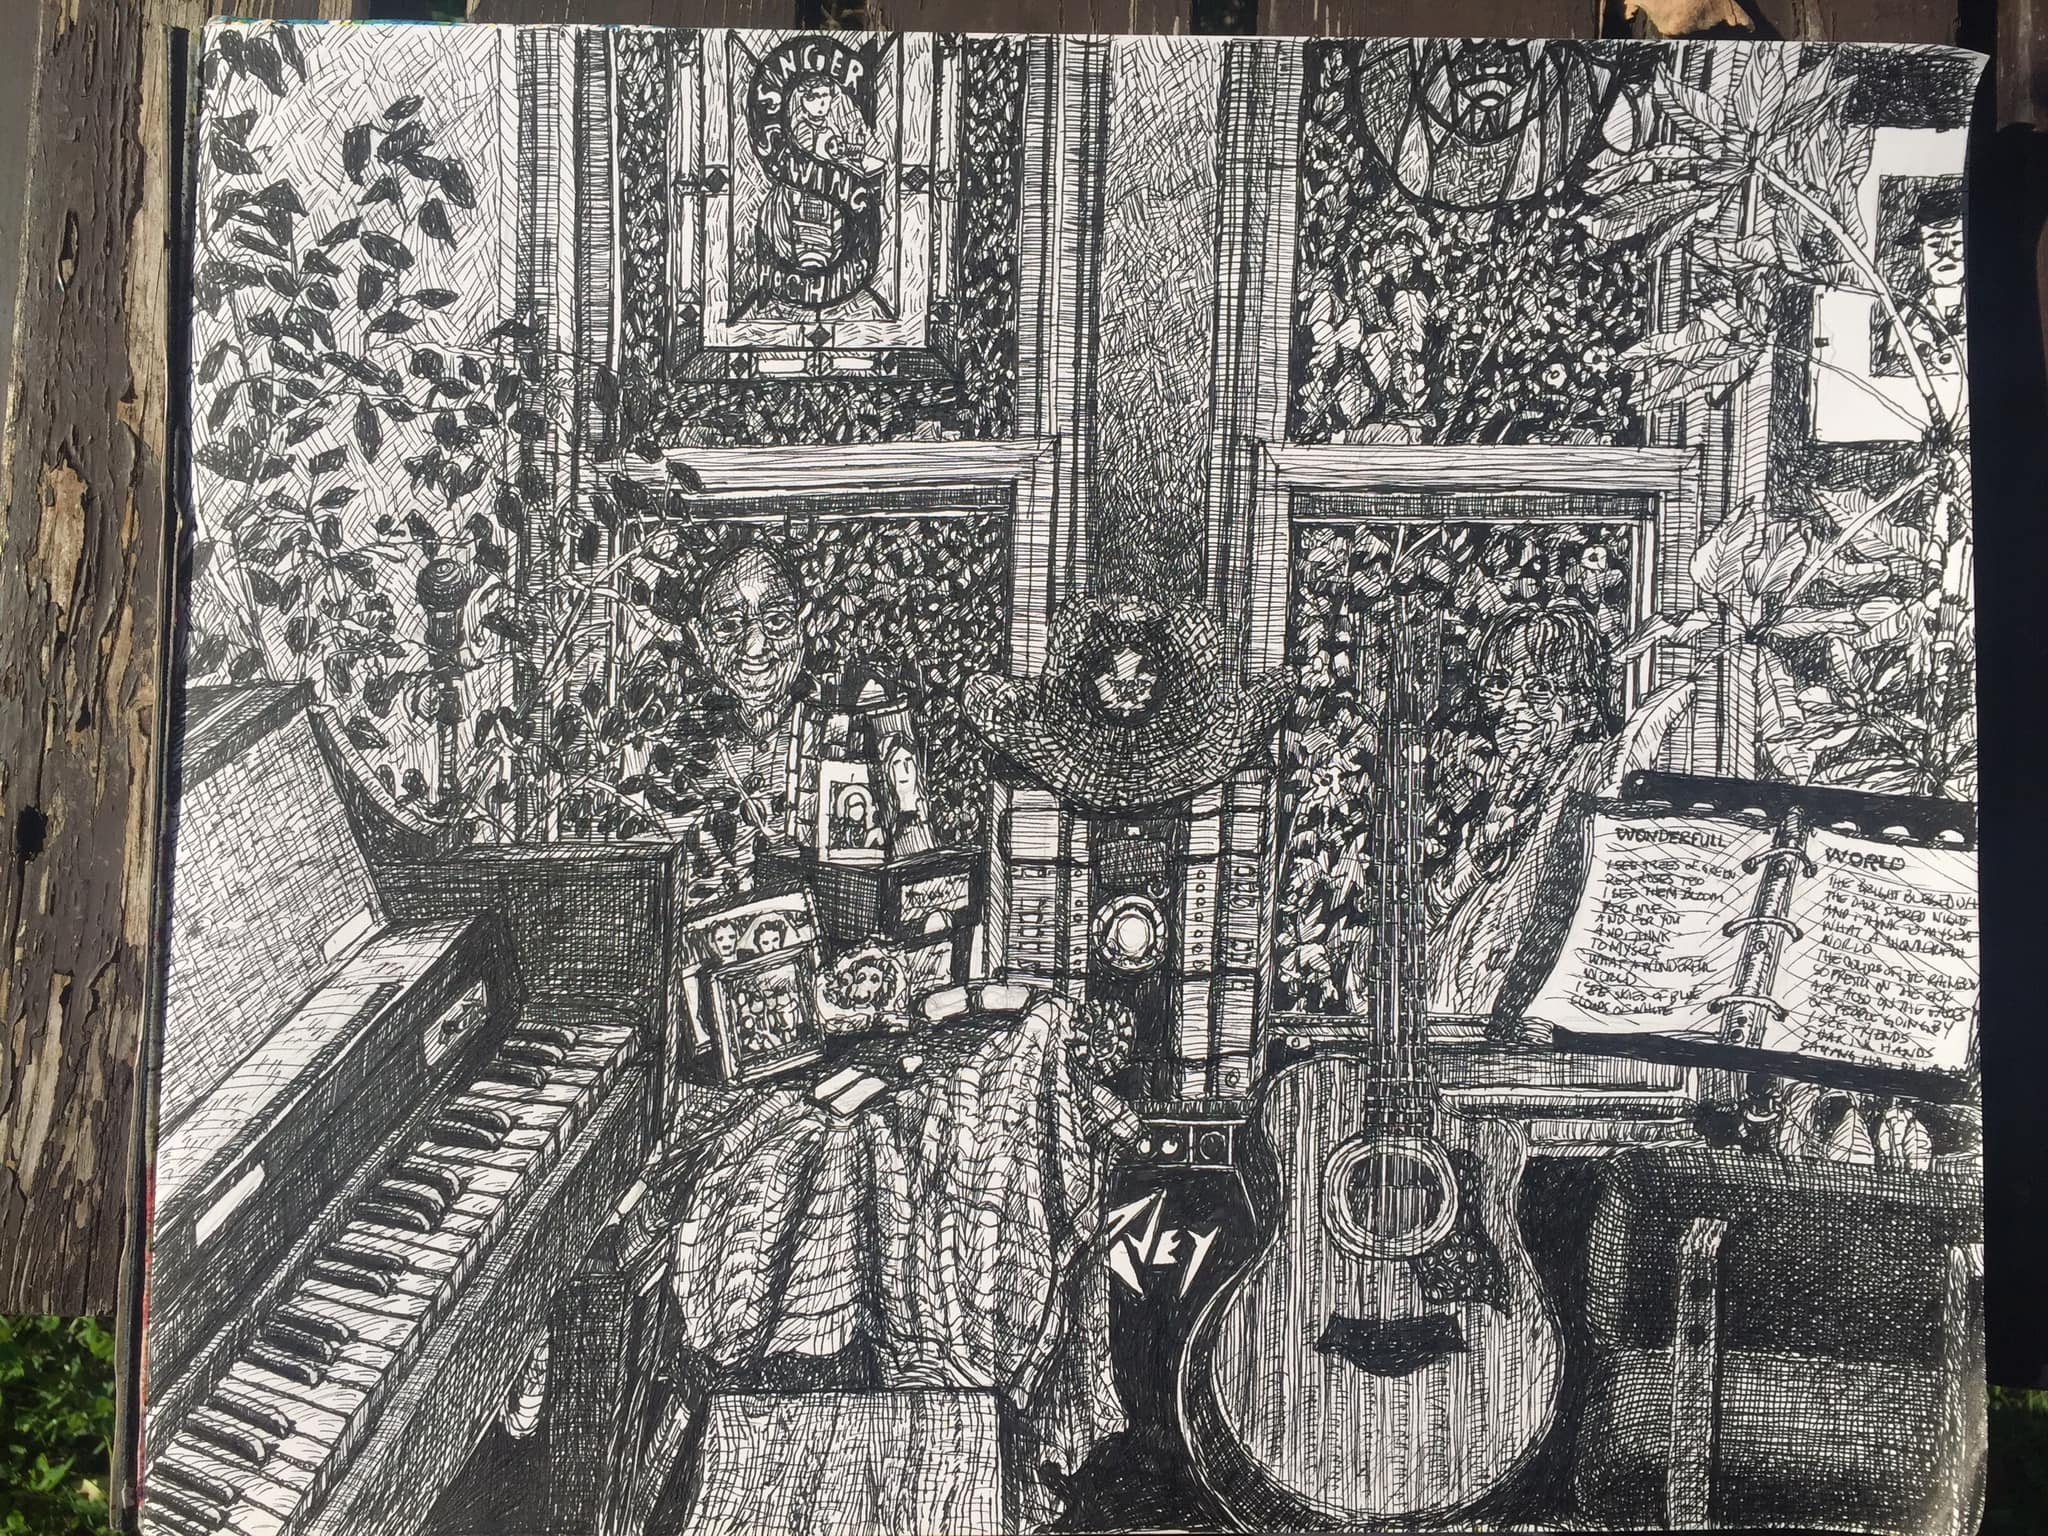 the-music-room---2235-manchester-drive-by-cork-ireland-freelance-artist---art-van-leeuwen